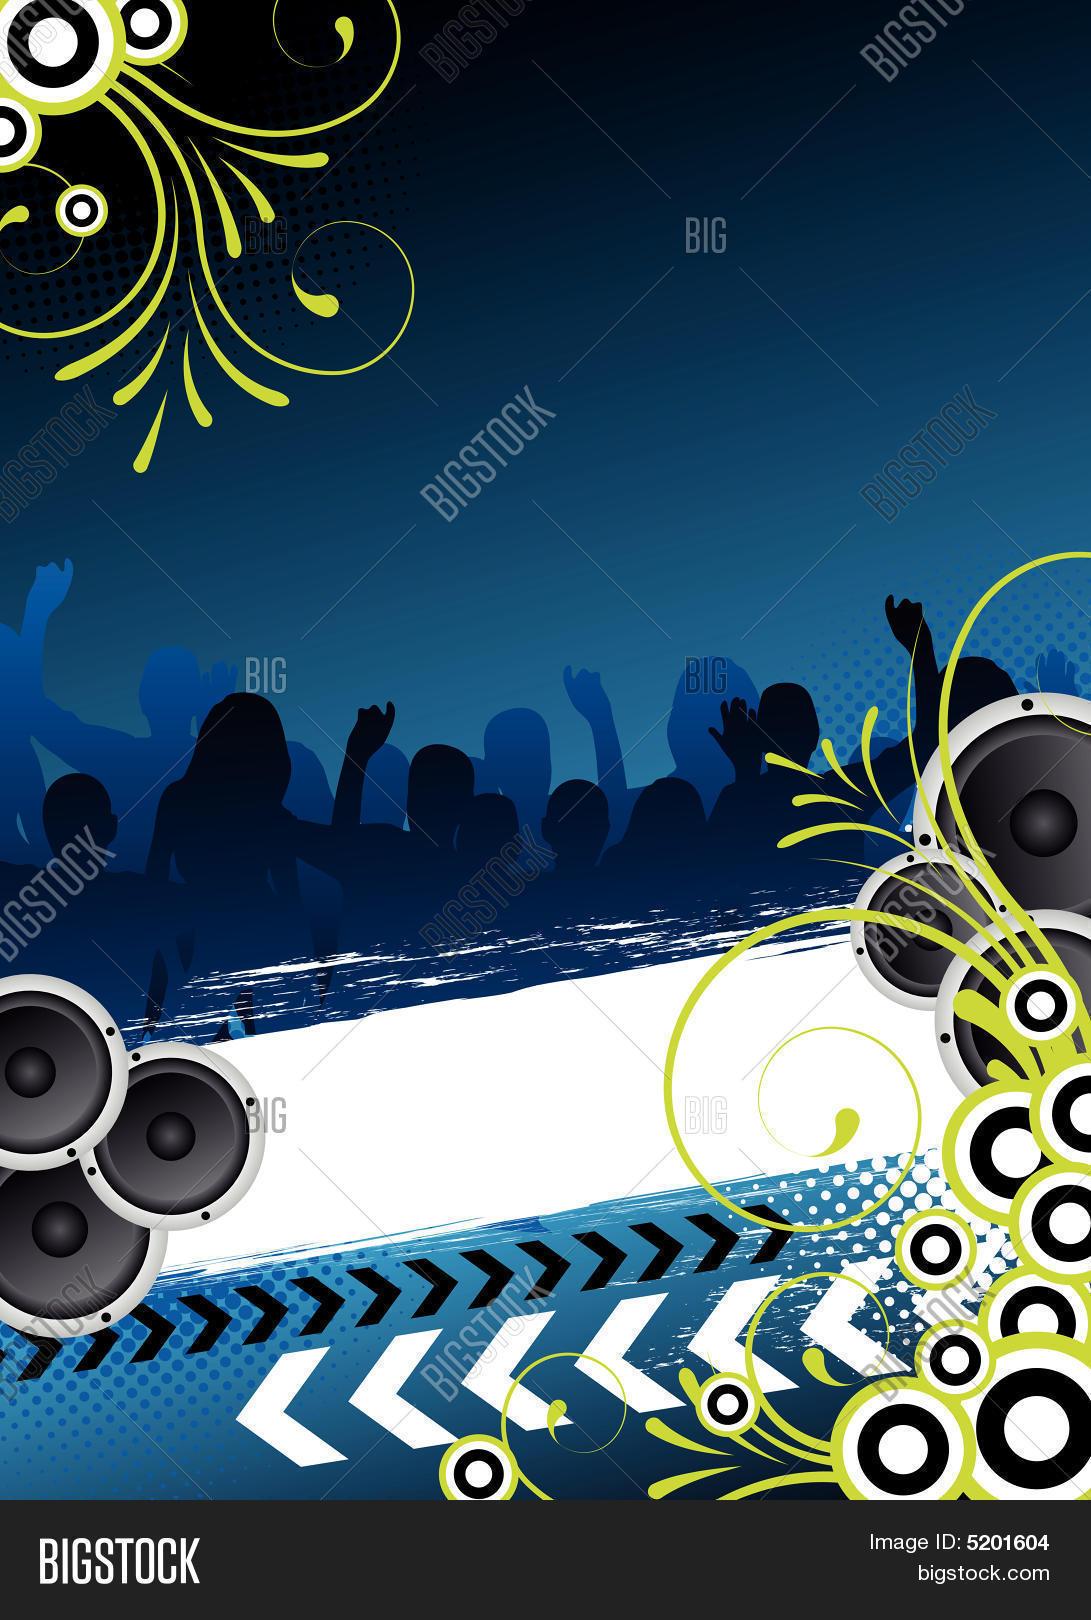 Conhecido Blue Party Flyer Design Vector & Photo | Bigstock TB28